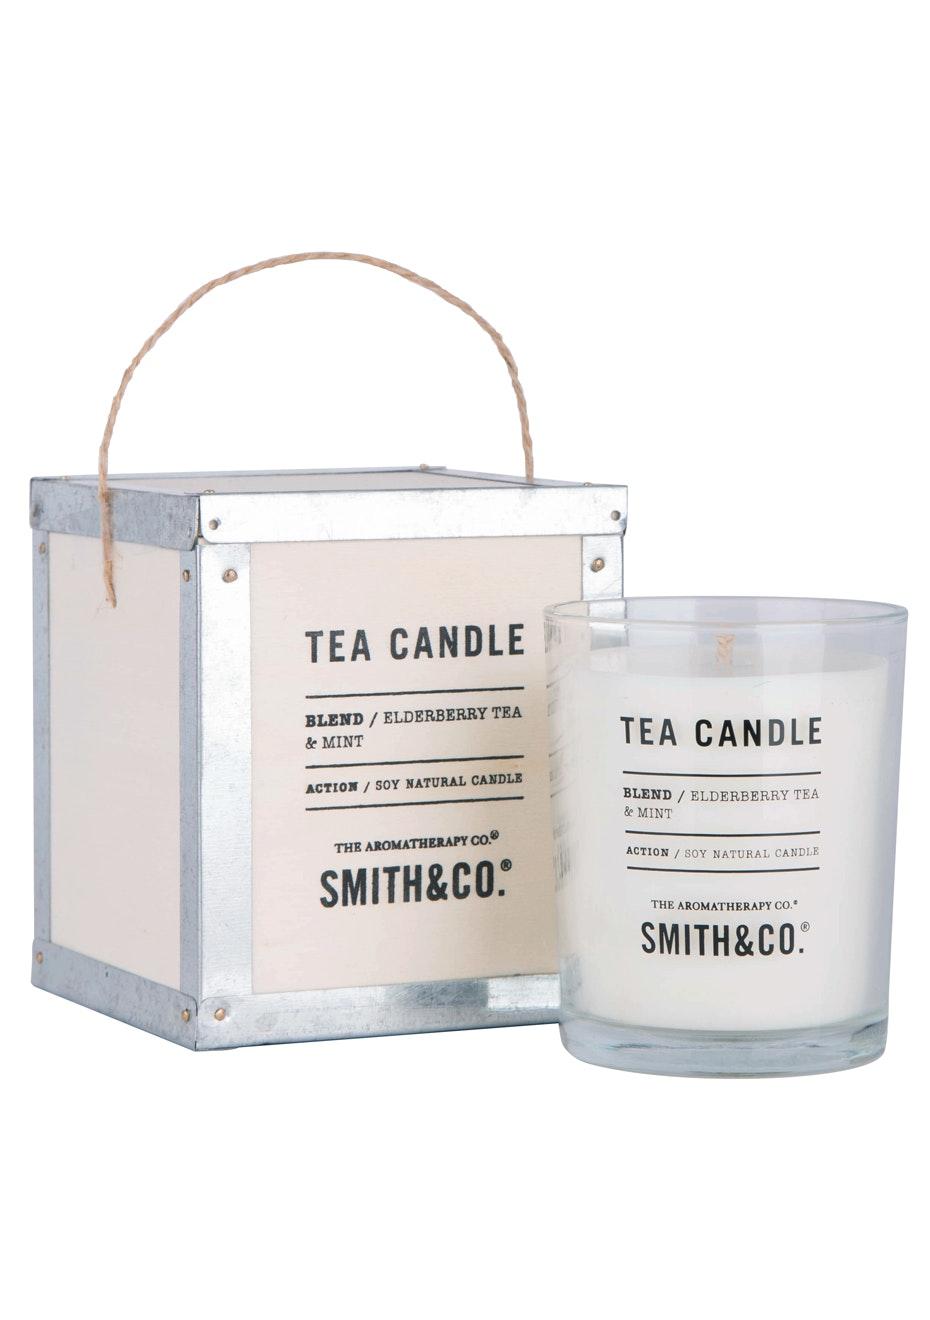 The Aromatherapy Co. Tea Chest Candle  - Elderberry Tea & Mint